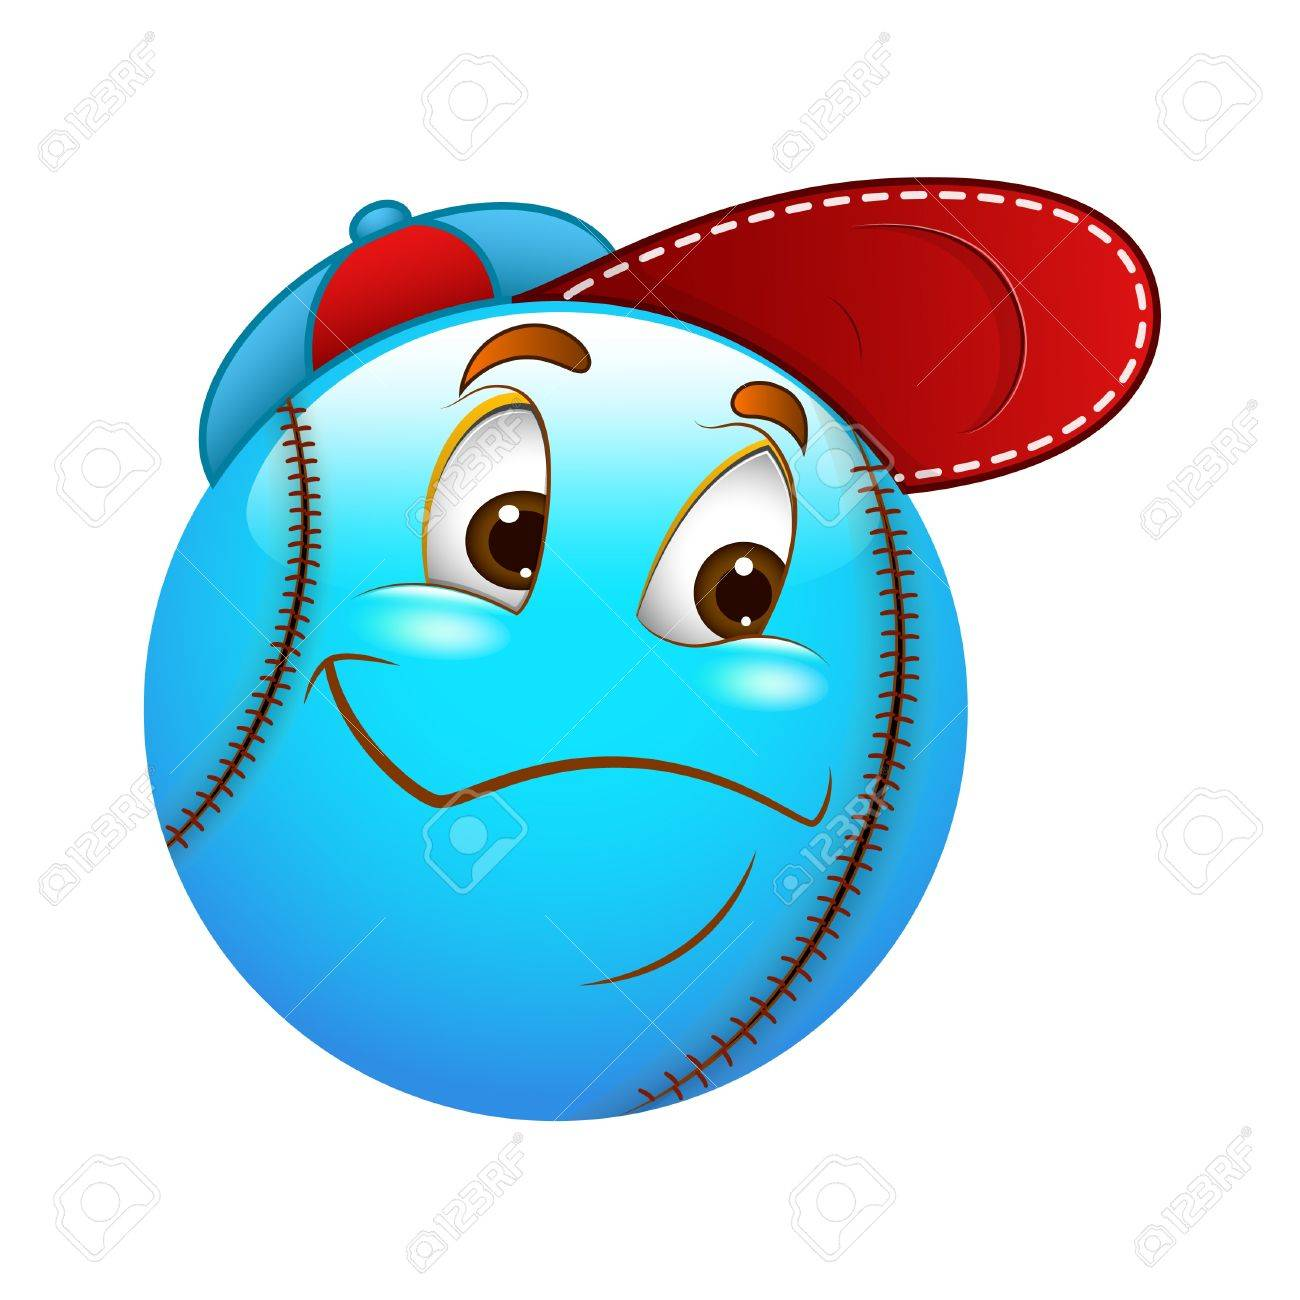 Smiley Emoticons Face Sportsman Stock Vector - 15808773